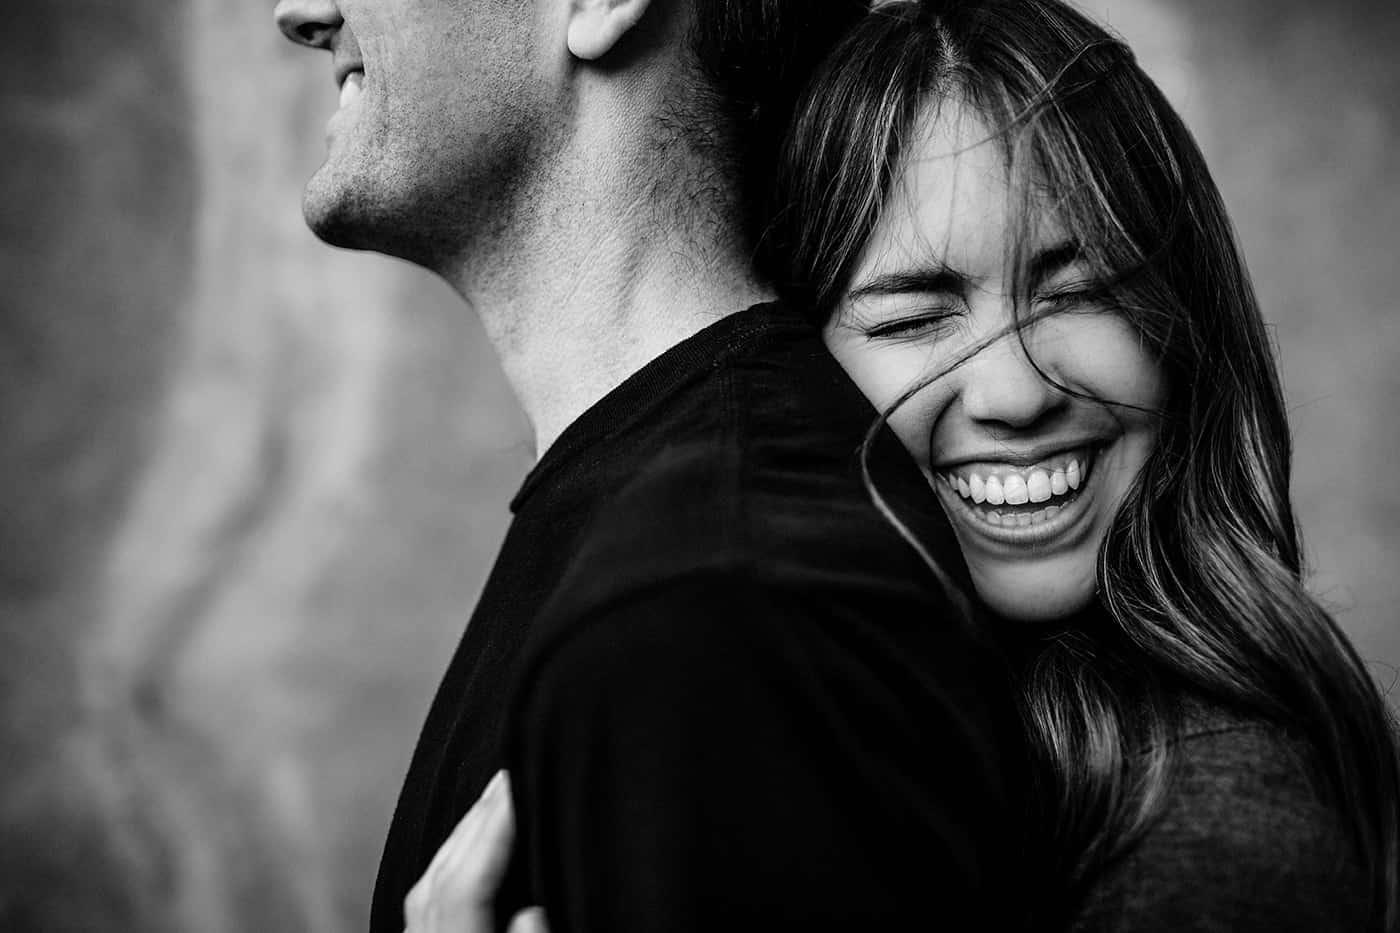 Couple portrait in close up black & white